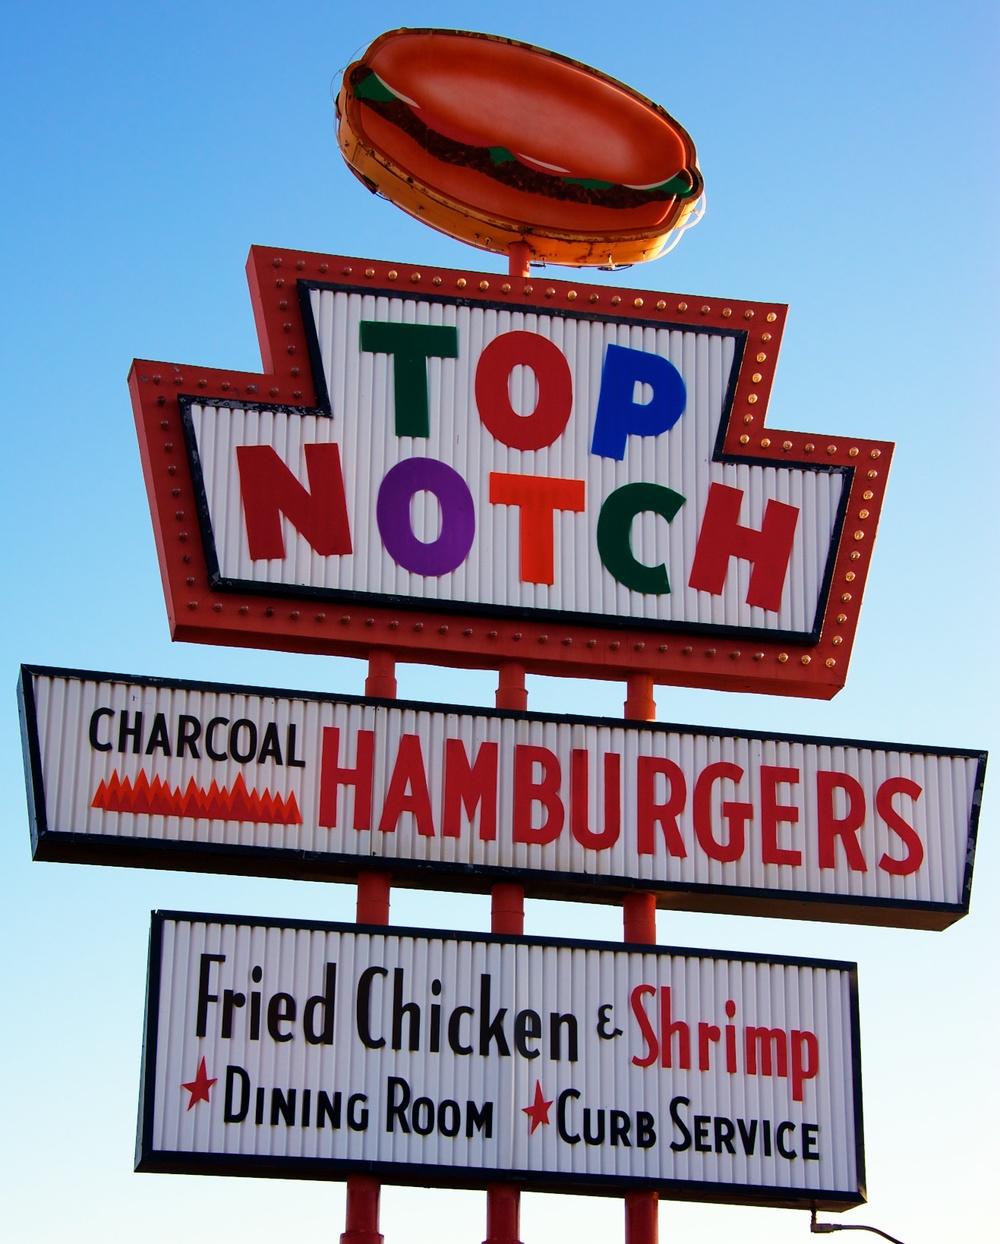 Top Notch burgers — Nomadic Pursuits - a blog by Jim Nix